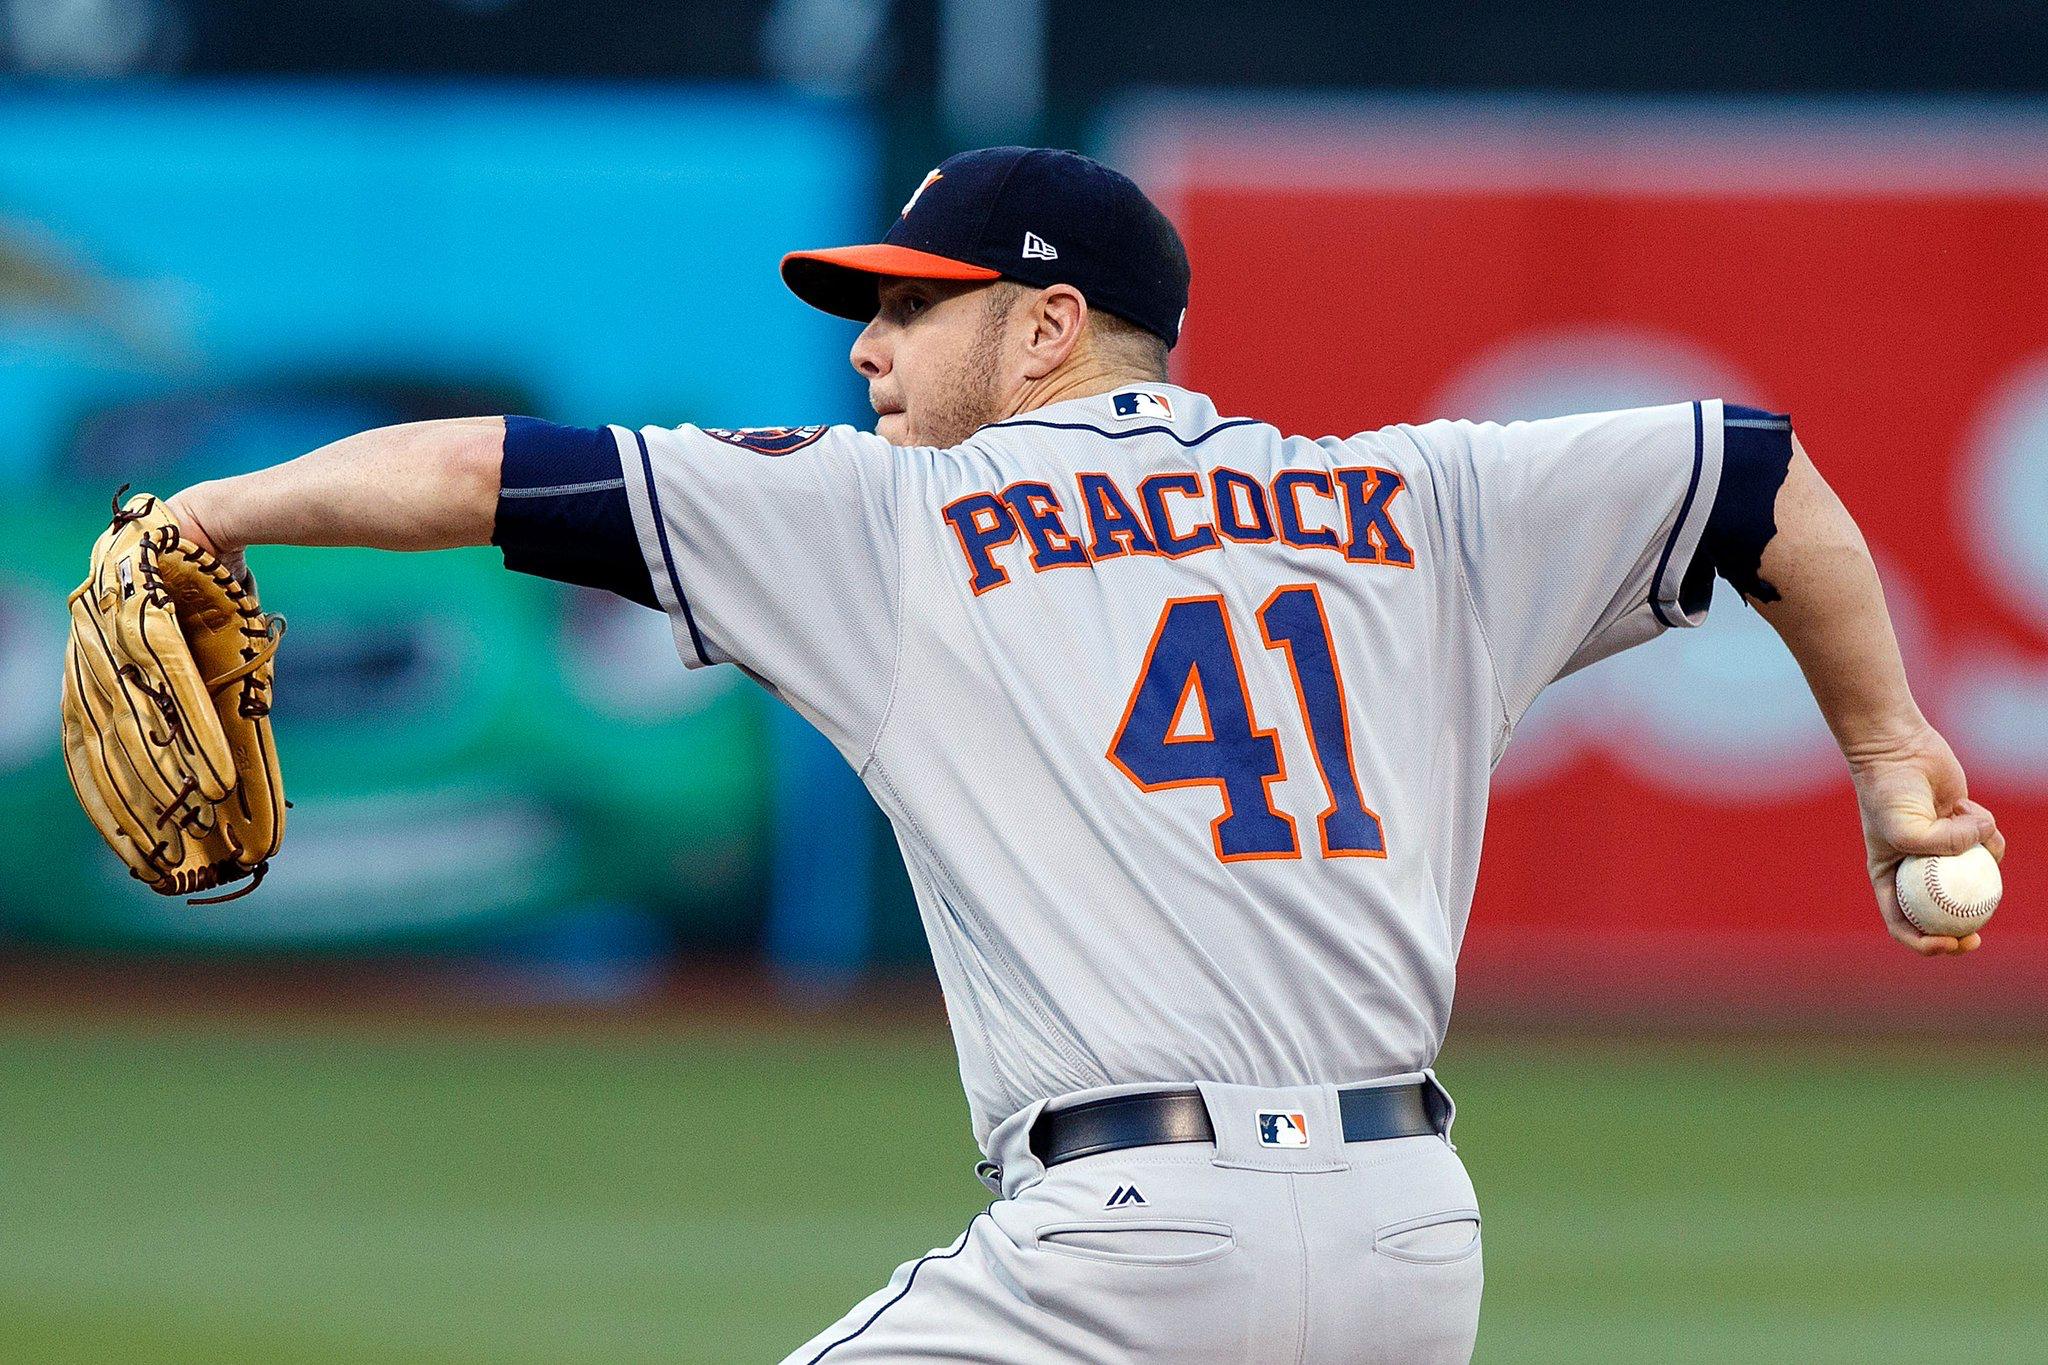 Brad Peacock Houston astros, Sports baseball, Astros